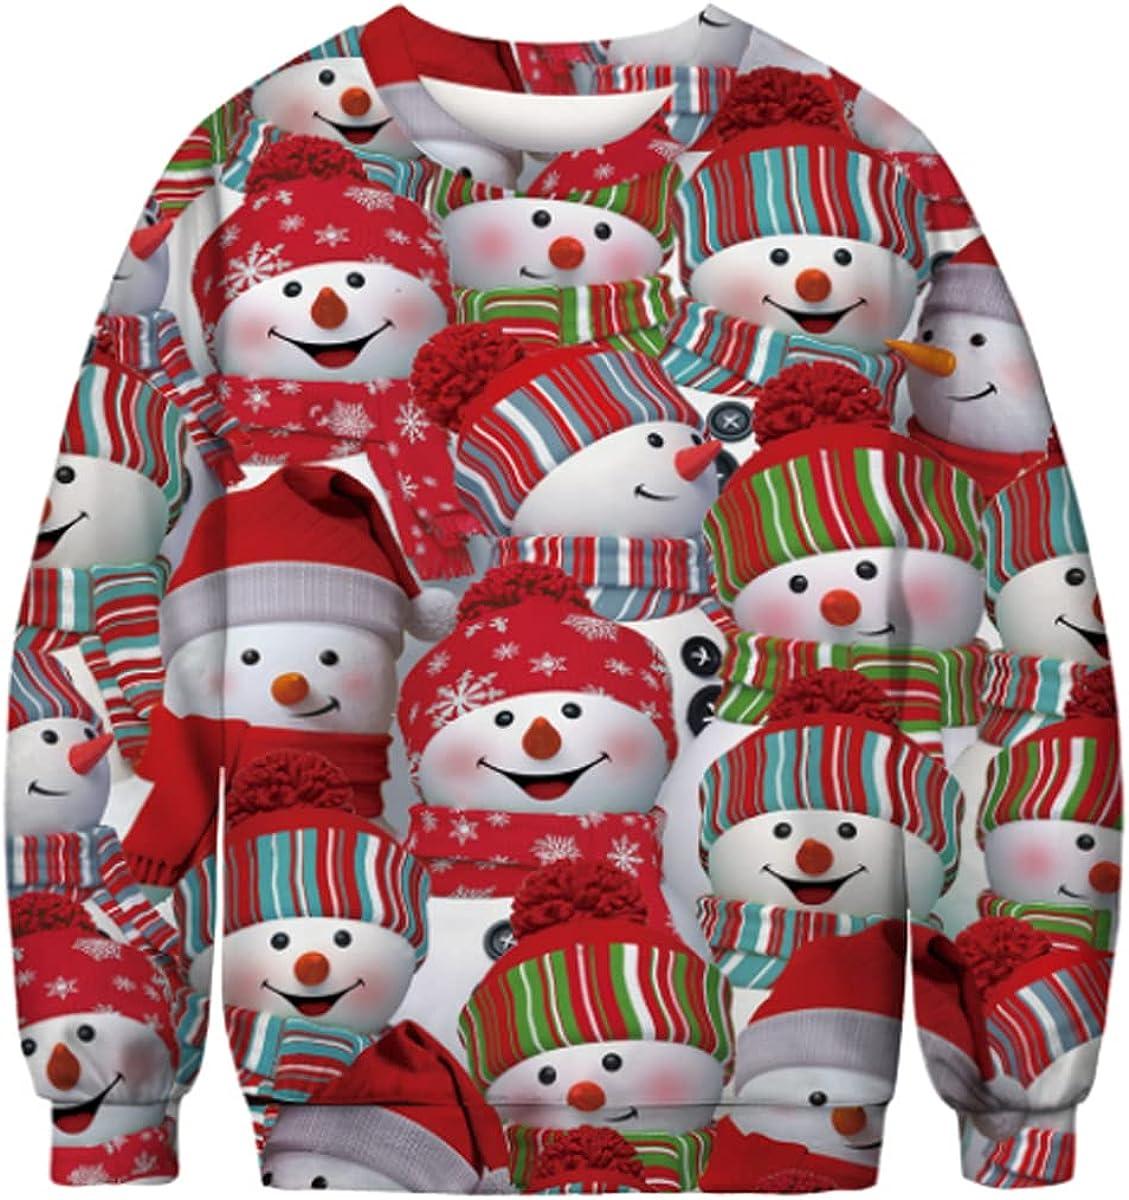 SENDEREAL Unisex 3D Printed Pattern Big Pocket Pullover Sweatshirt Suitable for Christmas and Halloween